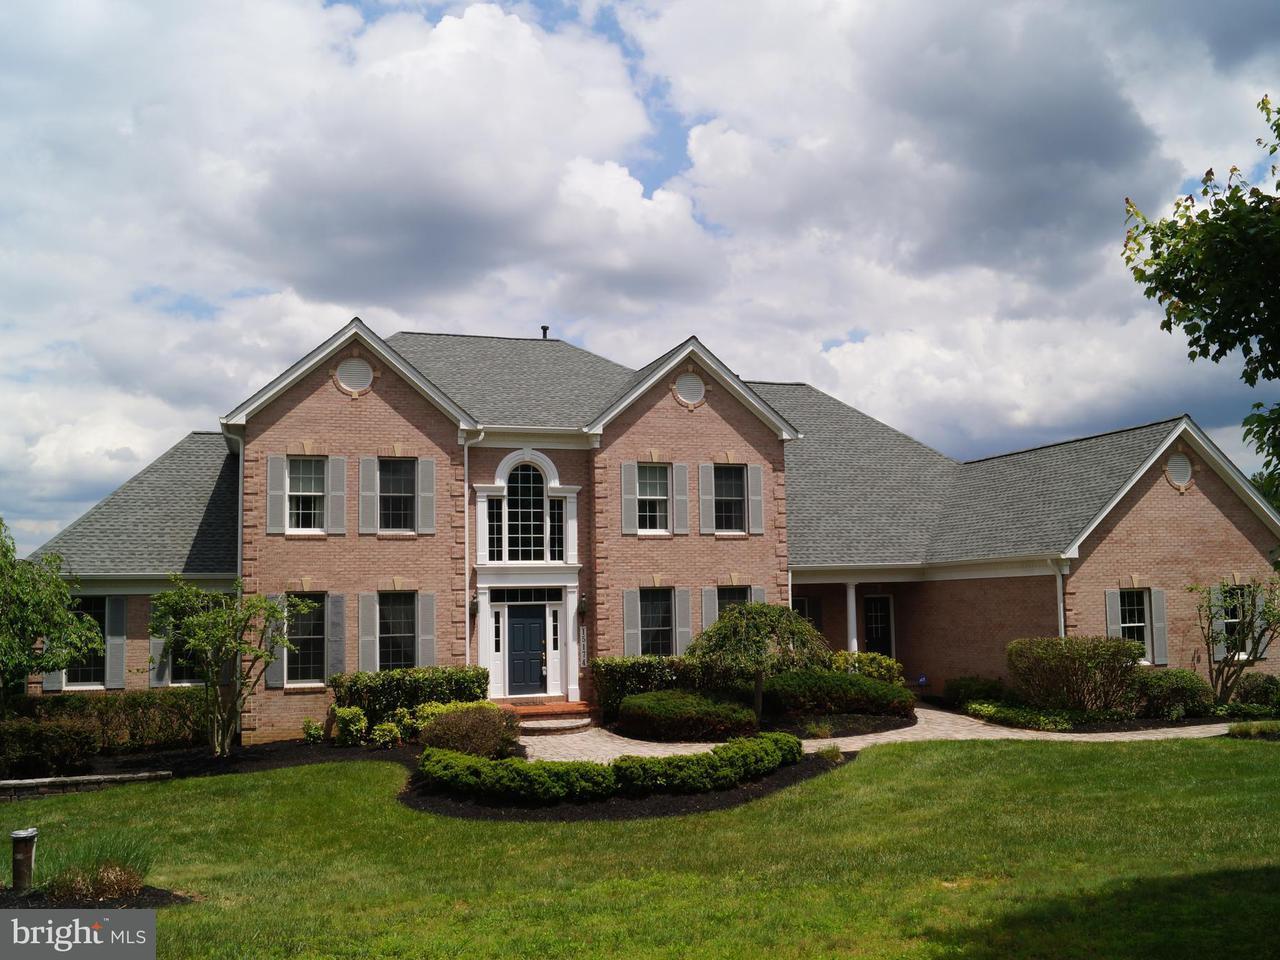 Single Family Home for Sale at 15174 Sapling Ridge Drive 15174 Sapling Ridge Drive Dayton, Maryland 21036 United States